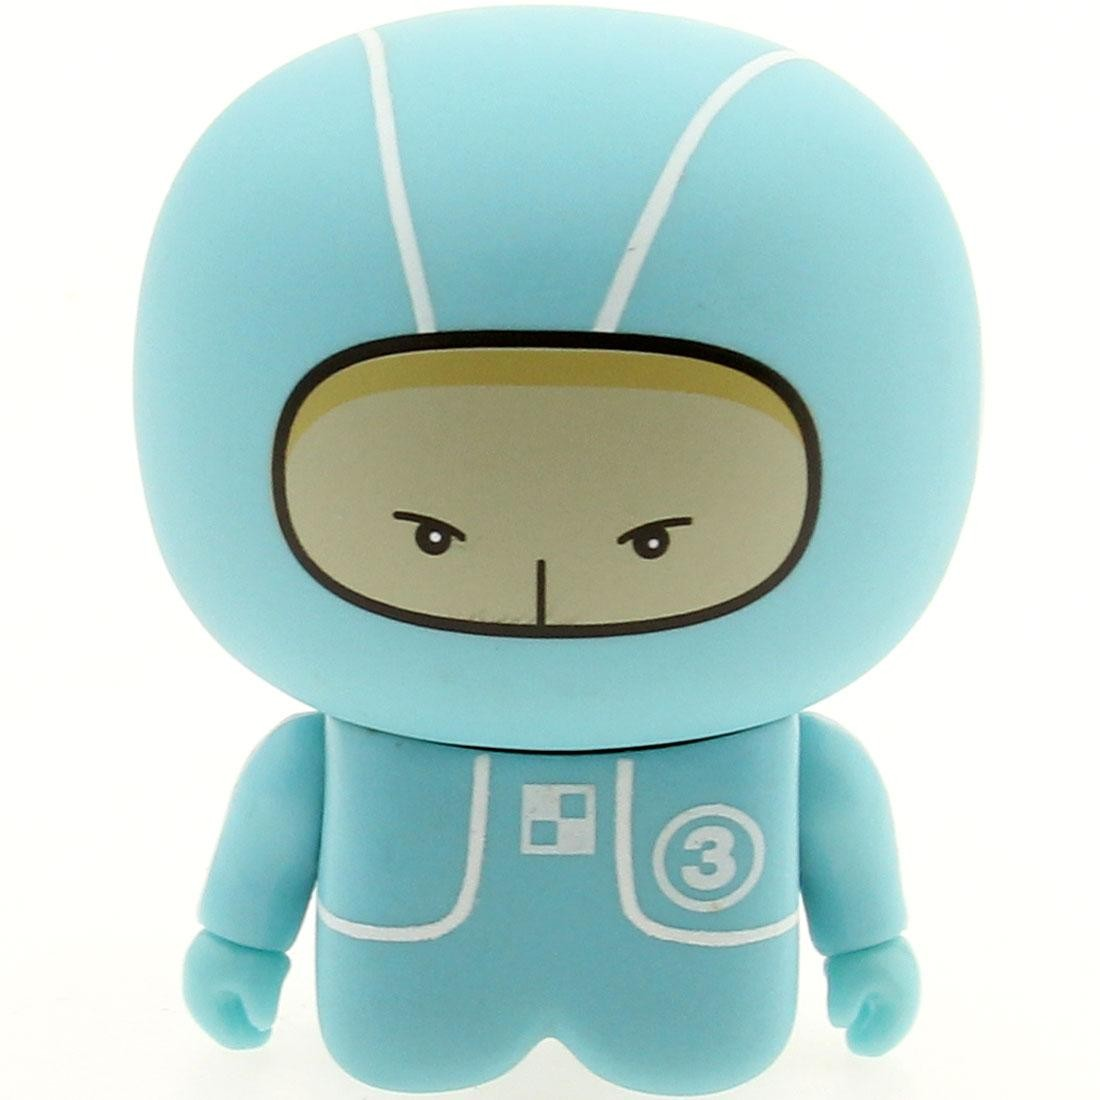 Unkl UniPO Speed Demons 3 Light Blue Tot Mini Figure Series 5 (blue / light blue)